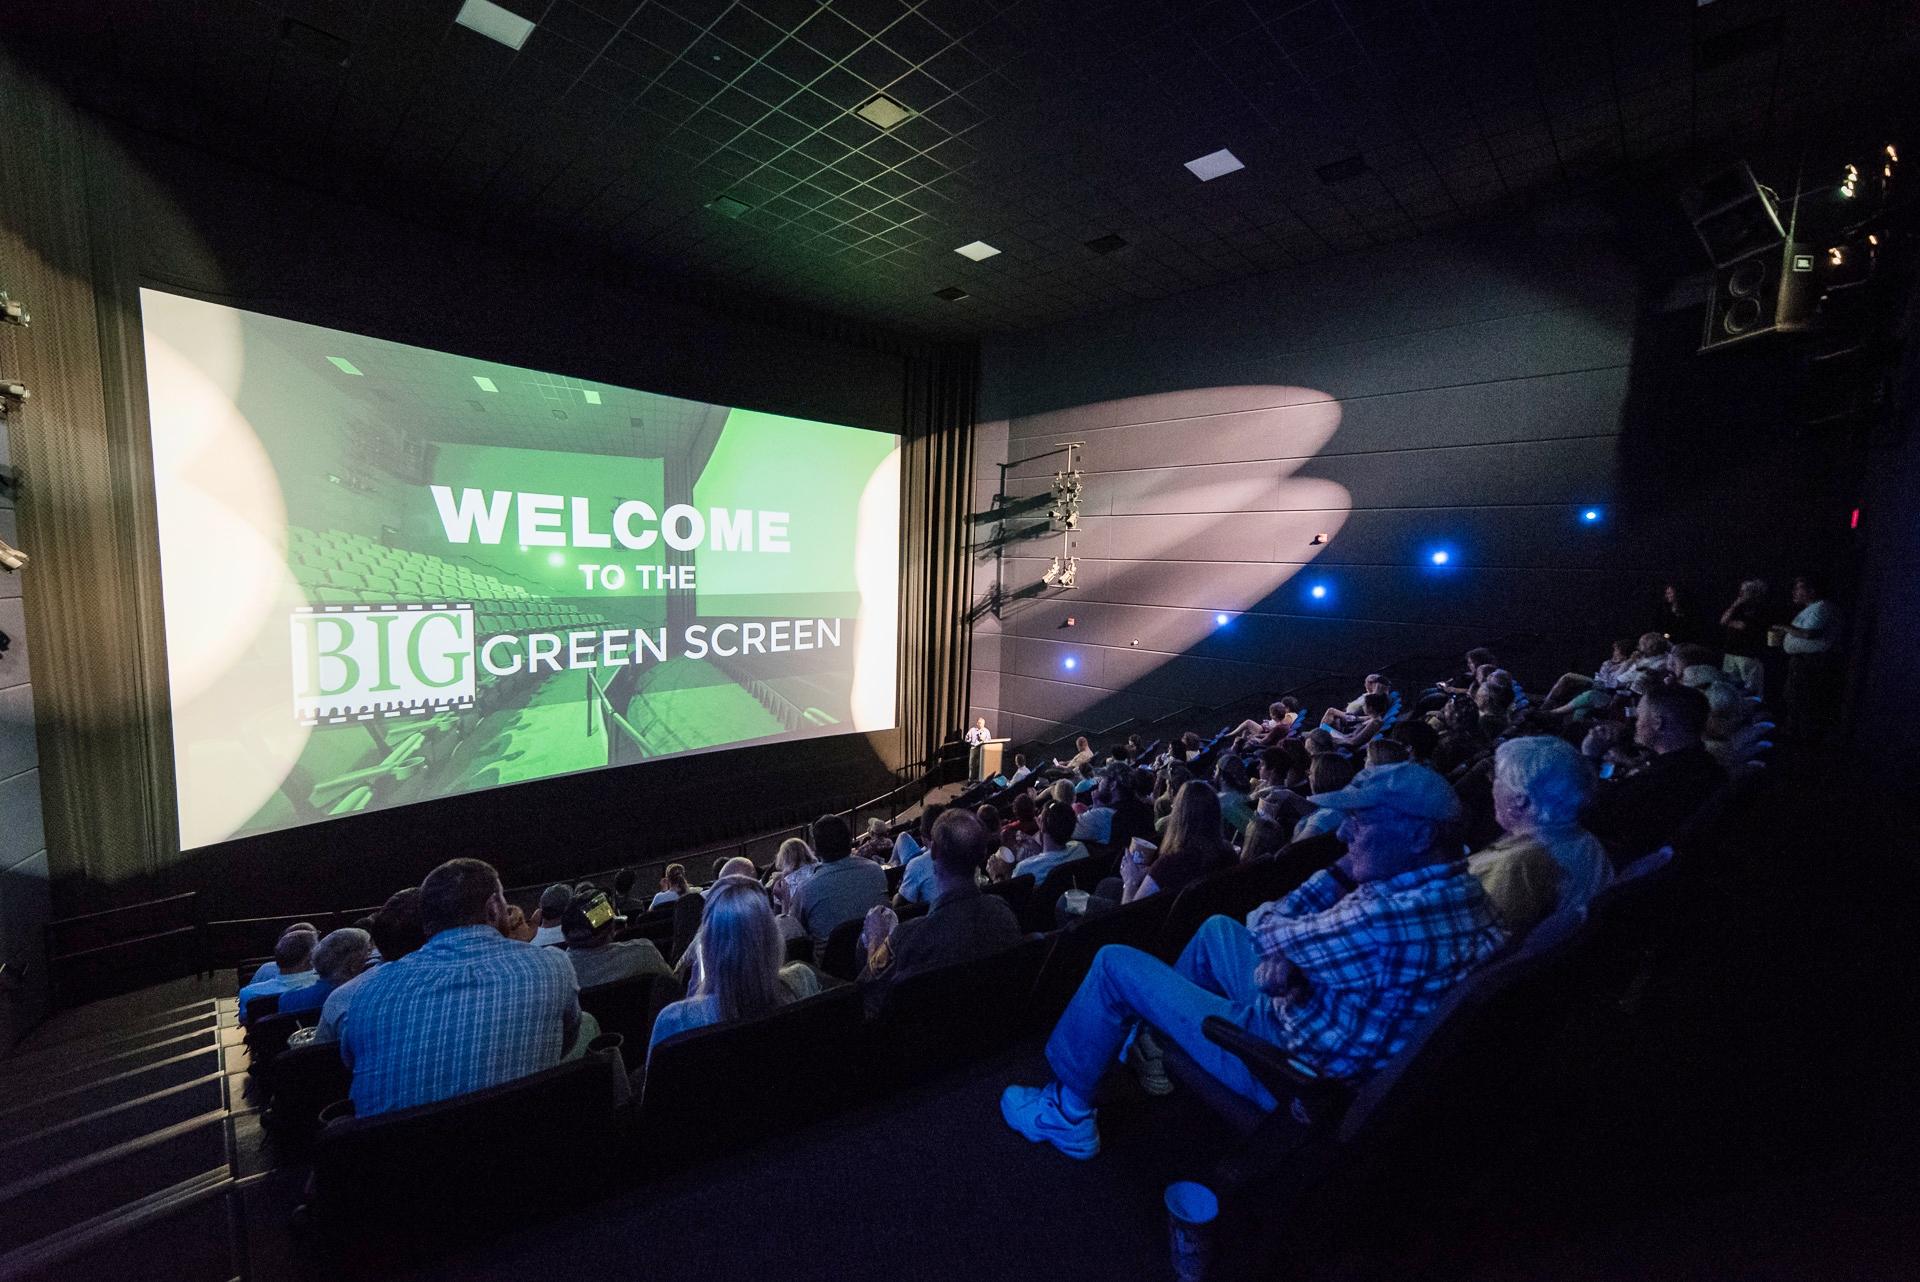 The  BIG Green Screen  at the Tom Ridge Environmental Center.  Visit  www.biggreenscreen.com !